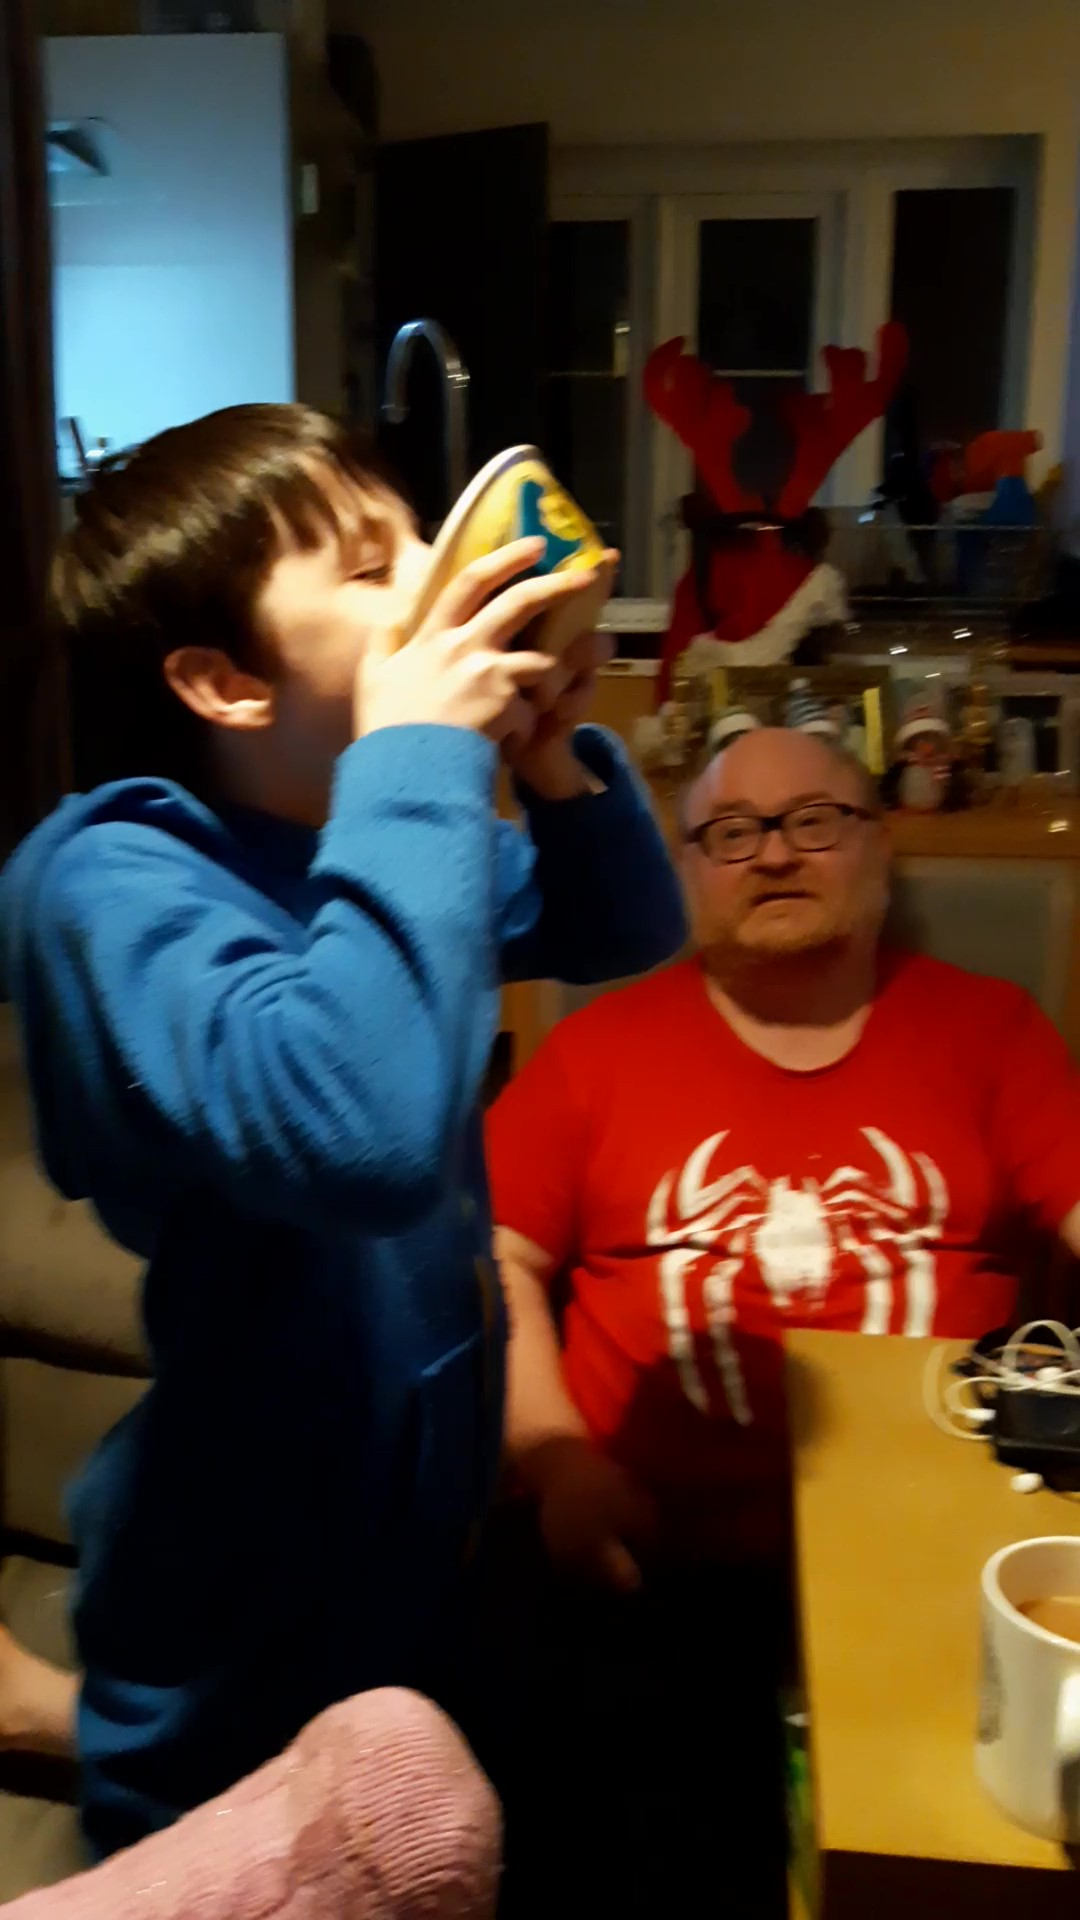 Josh stuffing his face